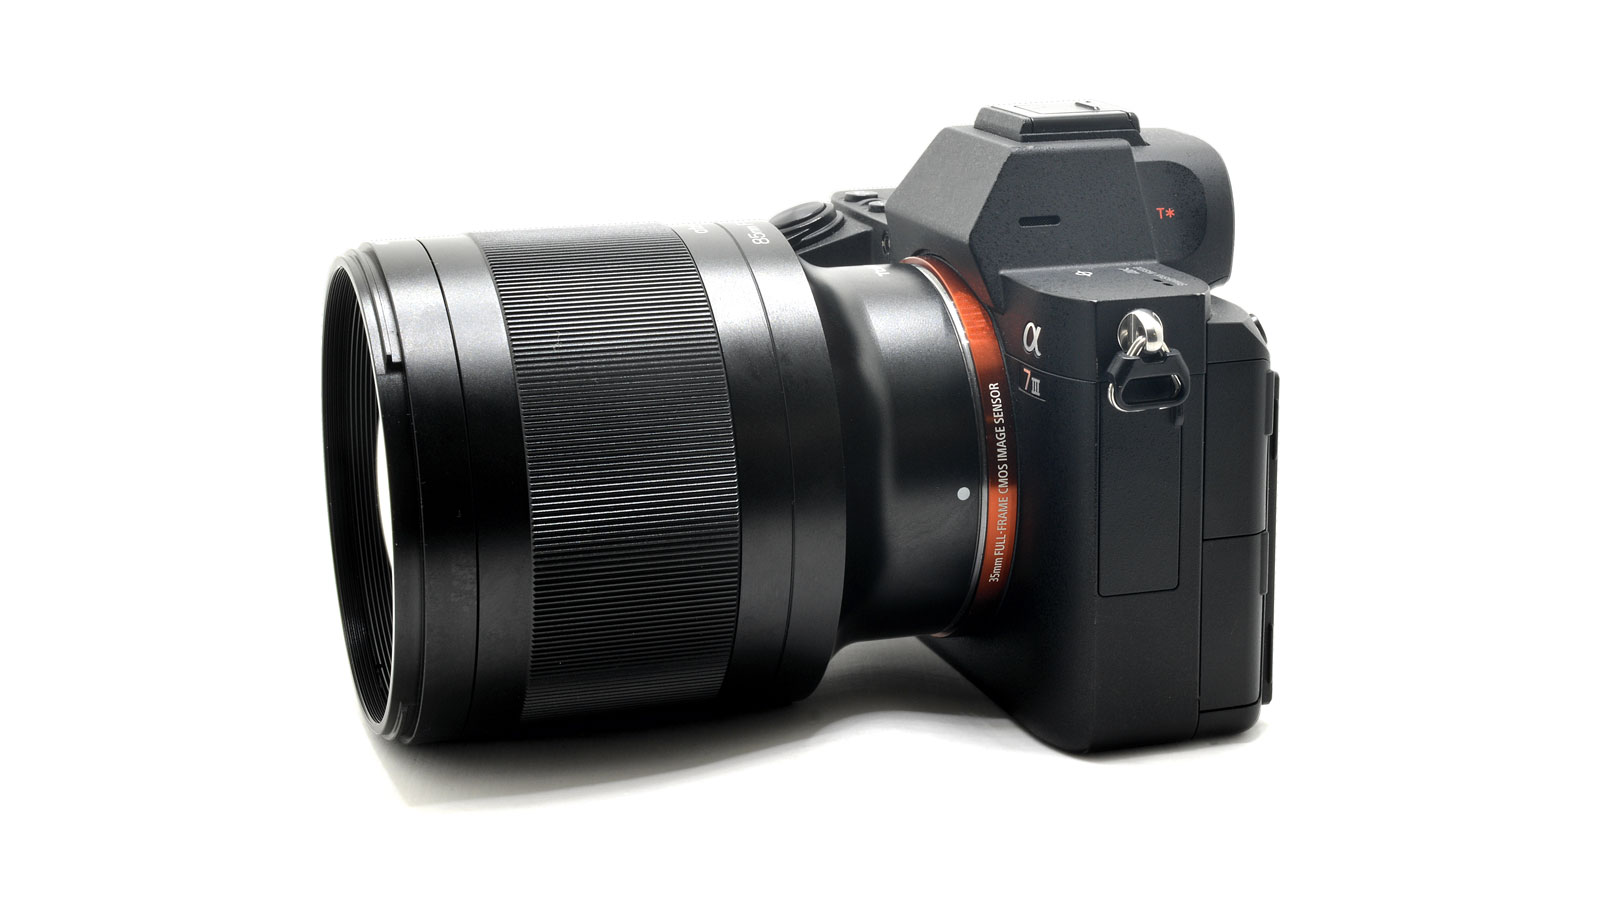 Tokina ATX-M 85mm f1.8 FE forum.sonyturk.com.jpeg